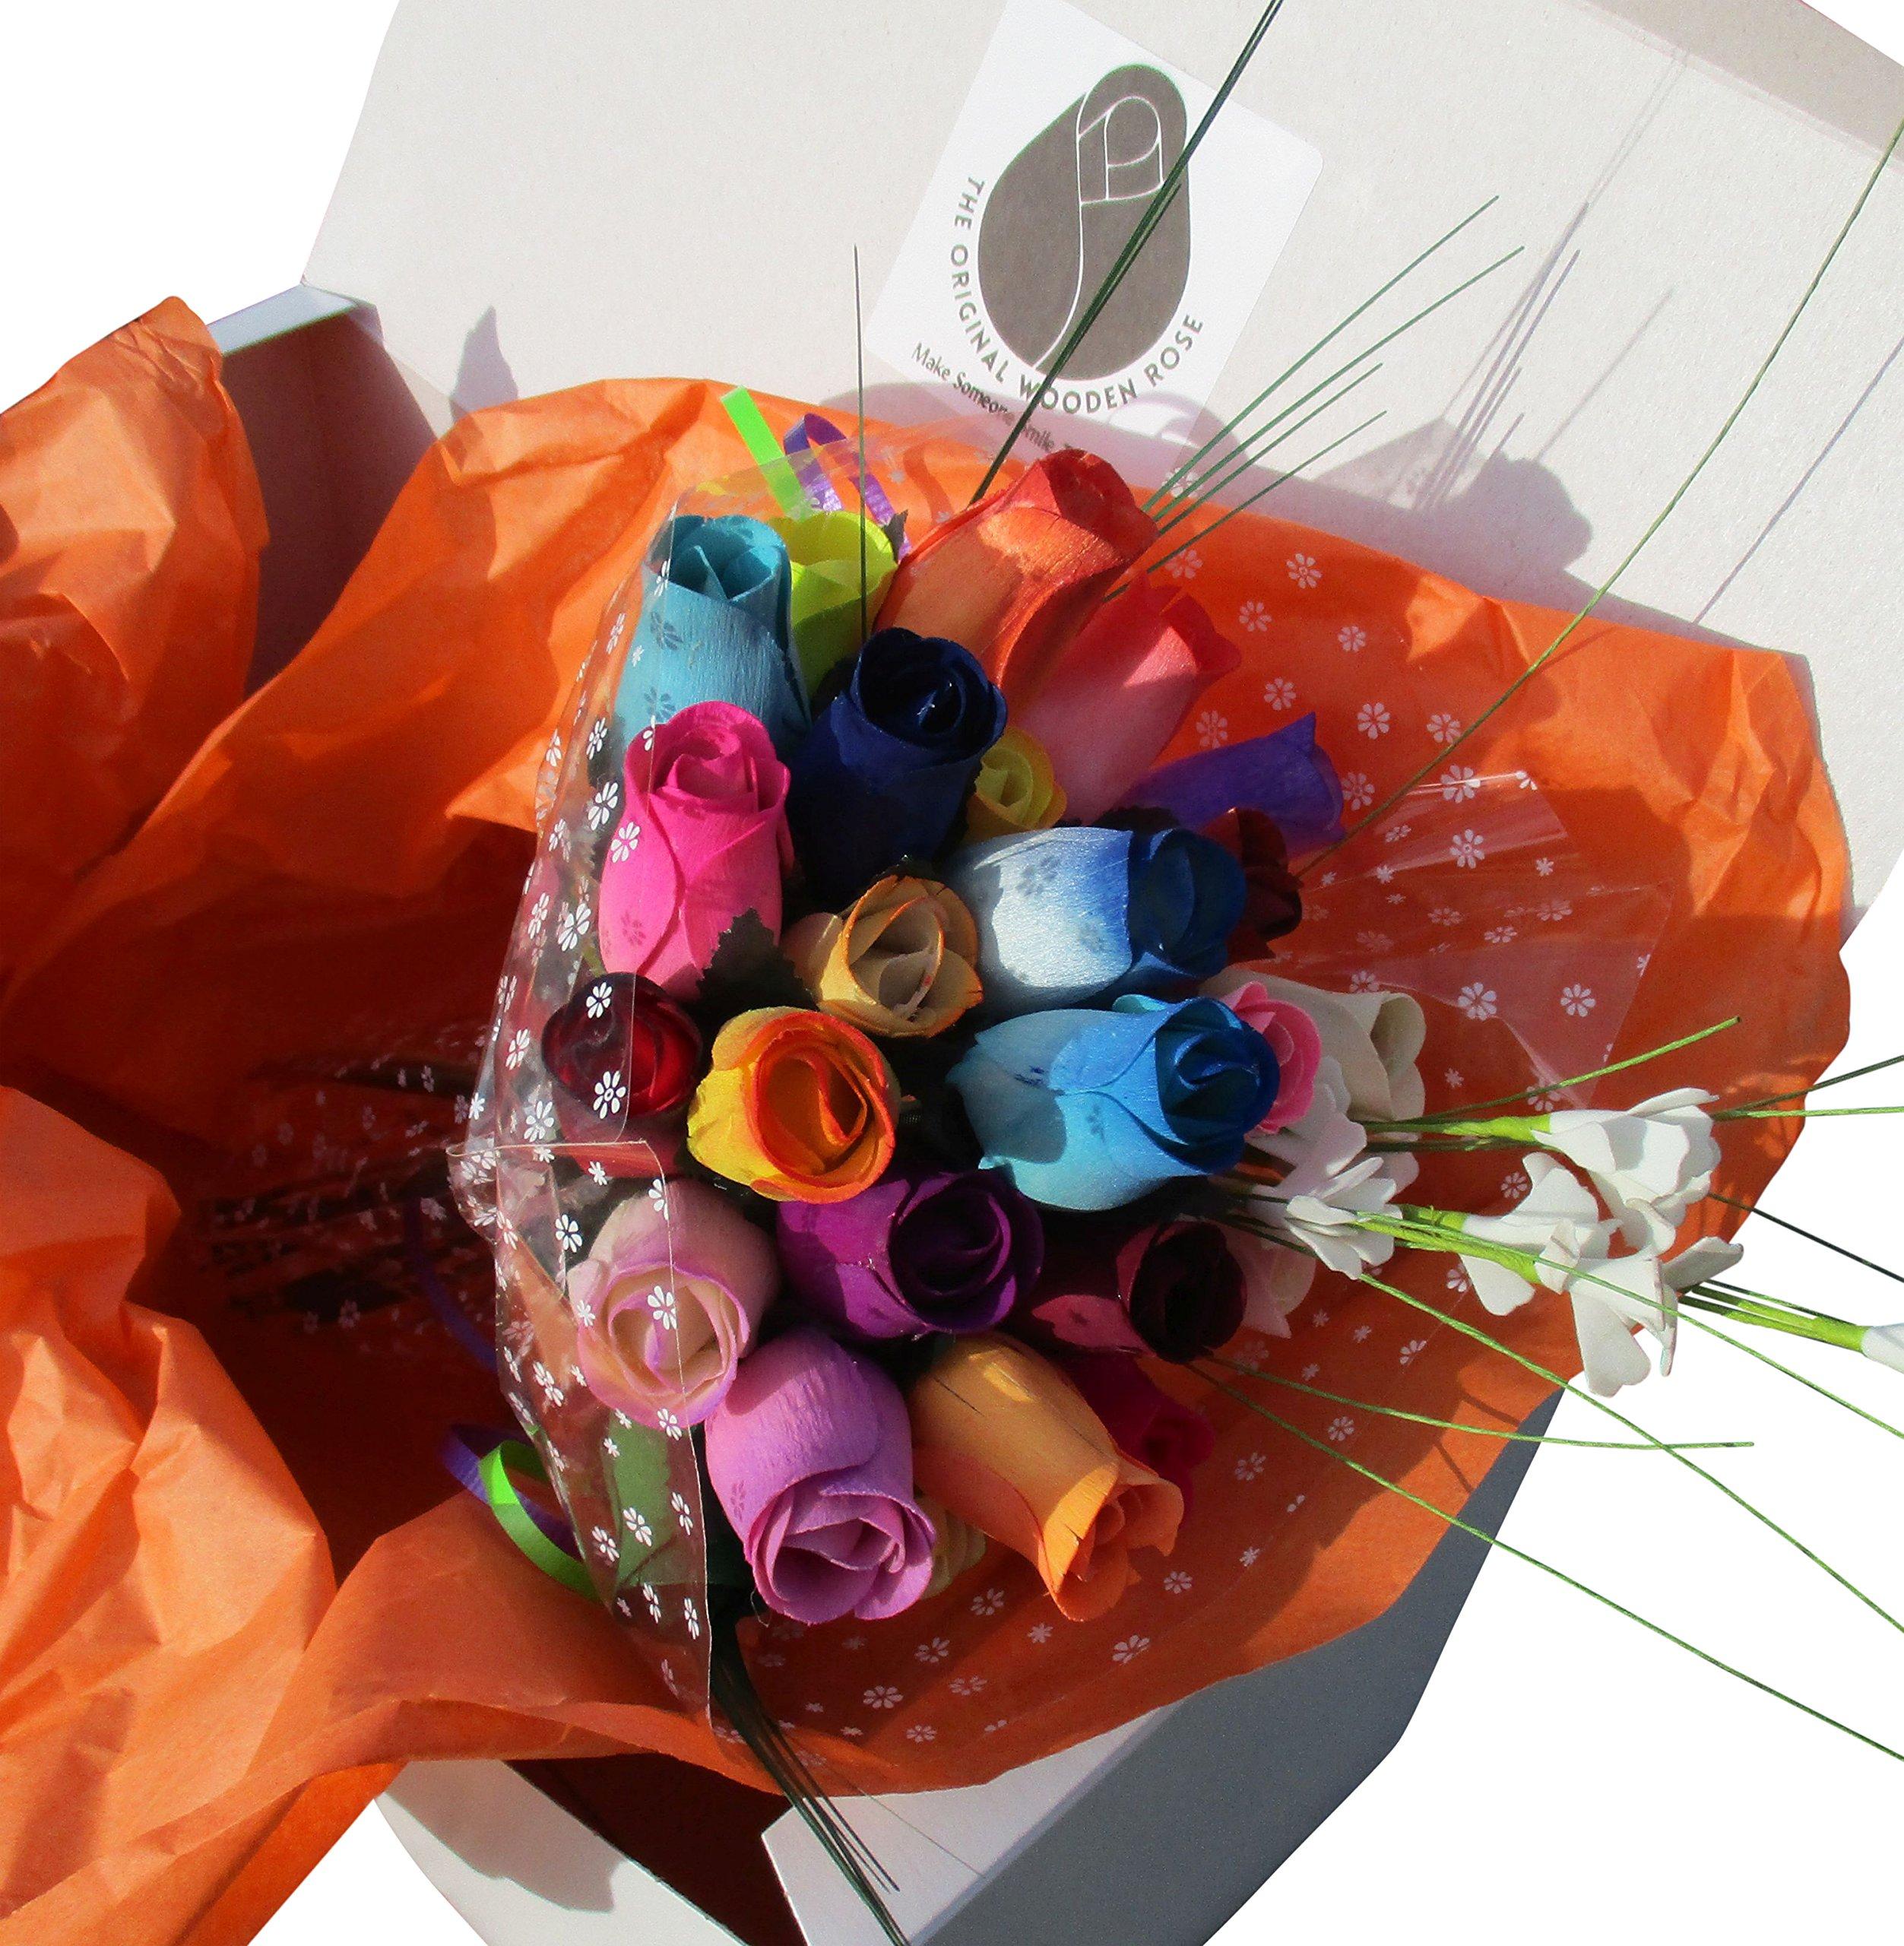 The Original Wooden Rose Assorted Colors Floral Flower Bouquets in a Gift Box (2 Dozen Bouquet) …